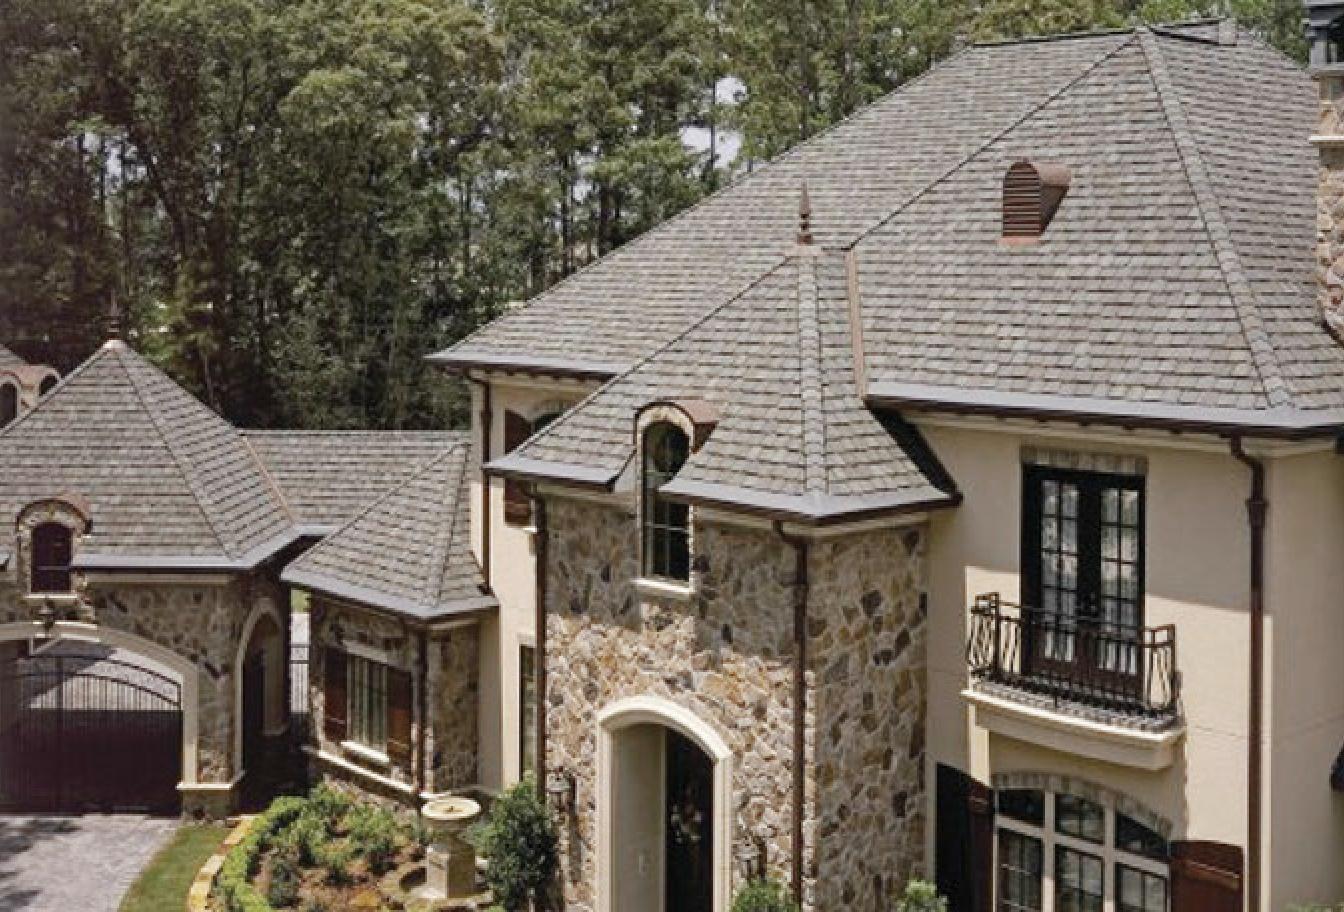 Roofing-HomestarBuilders-4